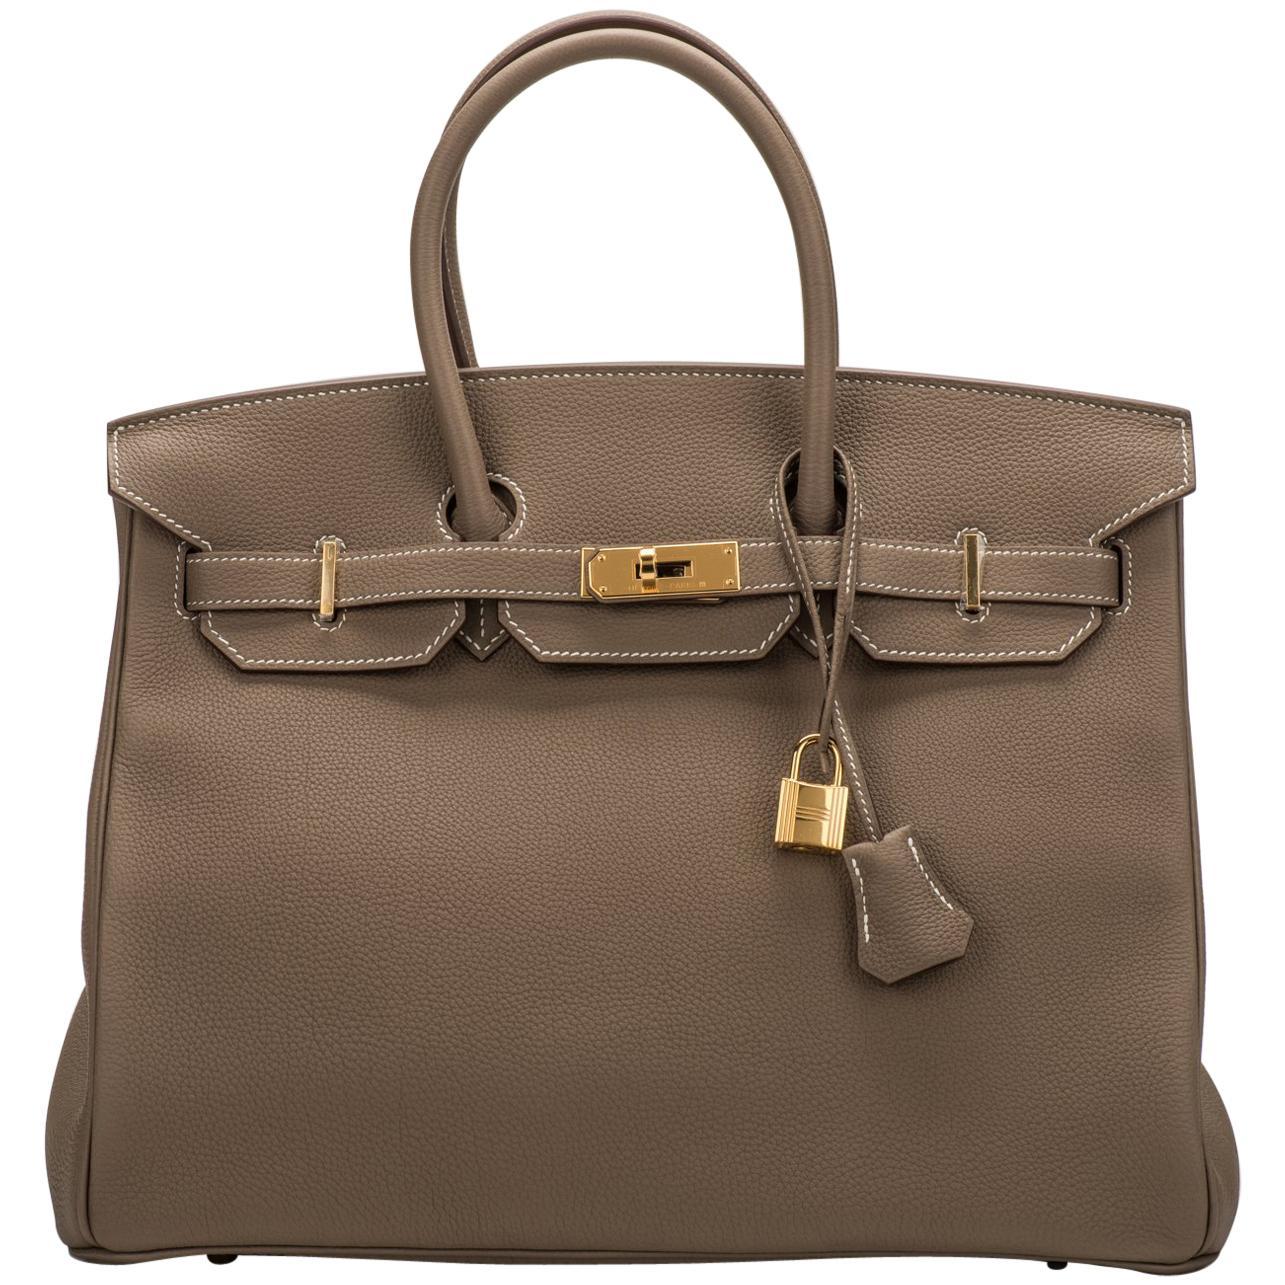 ... real new in box hermes birkin 35 etoupe gold togo bag 26778 7f080 2749d9065aeab